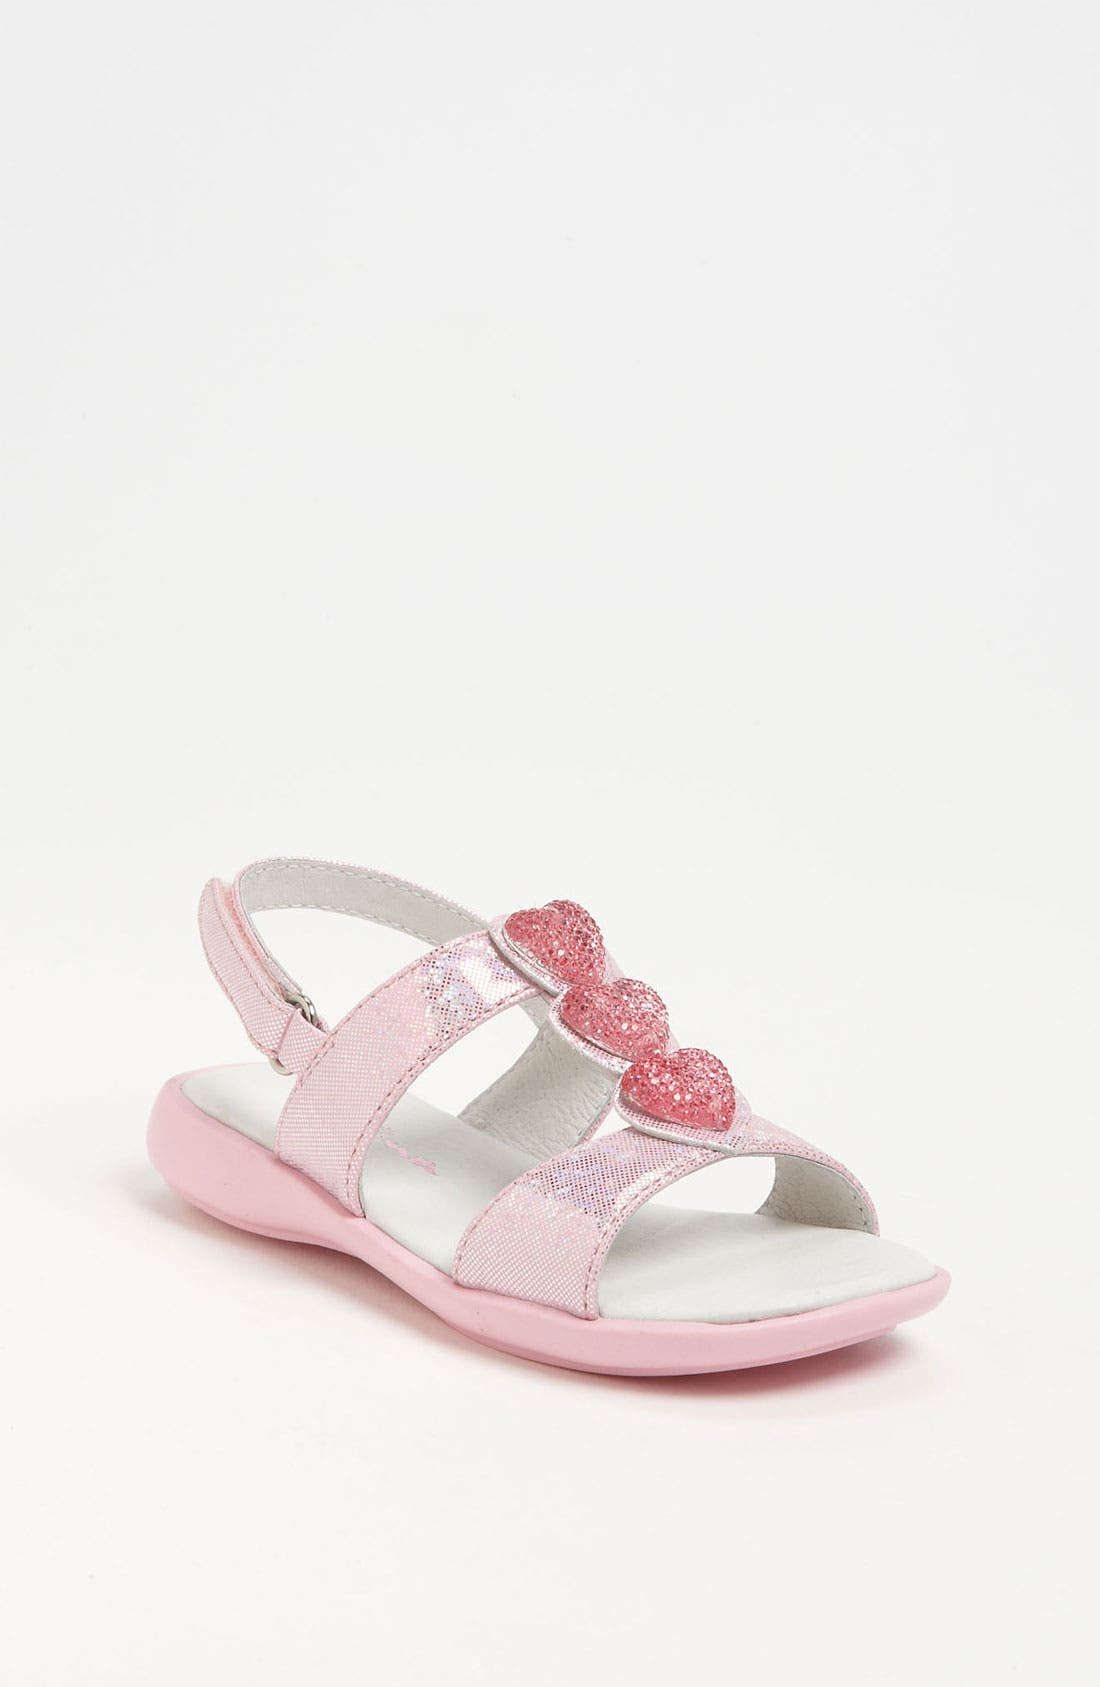 Main Image - Nina 'Clarina' Heart Sandal (Walker & Toddler)